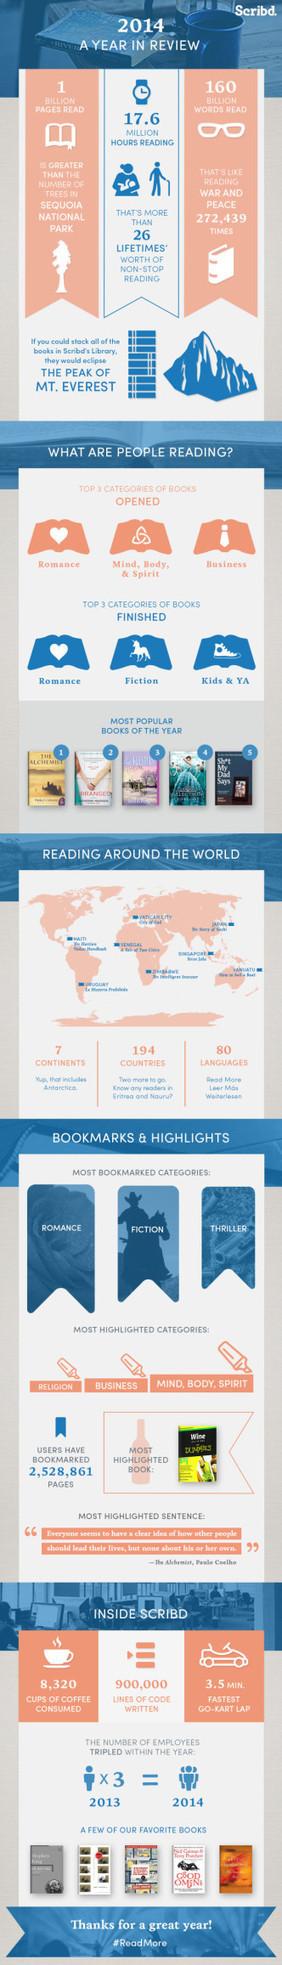 Reading habits of ebook subscribers (infographic) | SEDICI | Acceso abierto | Scoop.it